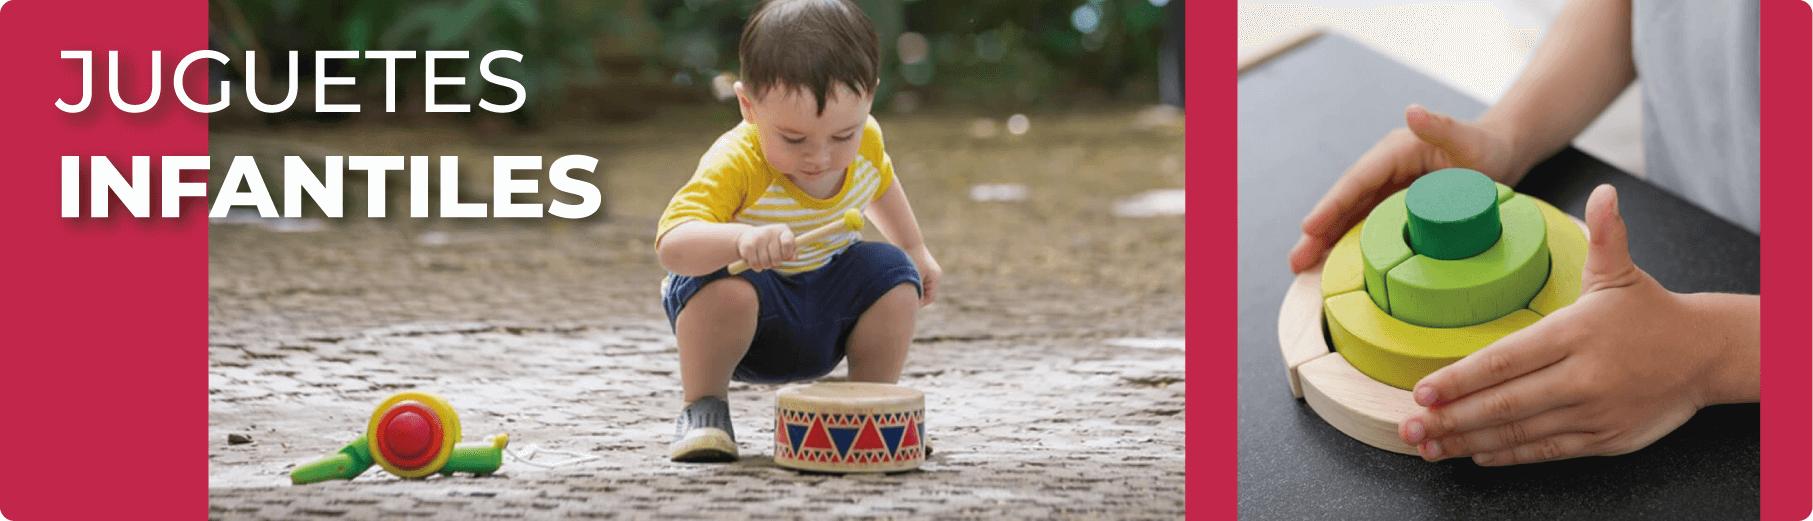 cucunat-categoria-juguetes-infantiles